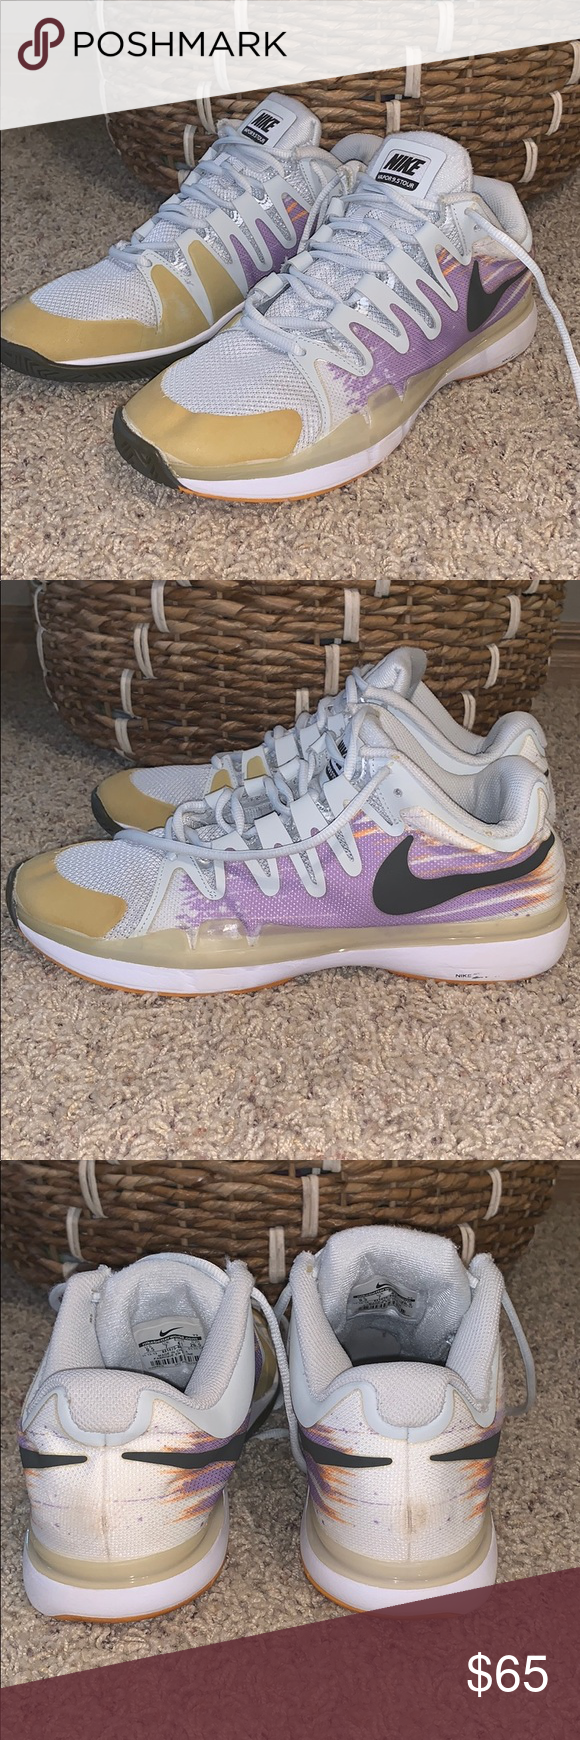 Nike Vapor Tennis Court Shoes Tennis Court Shoes Court Shoes Nike Vapor